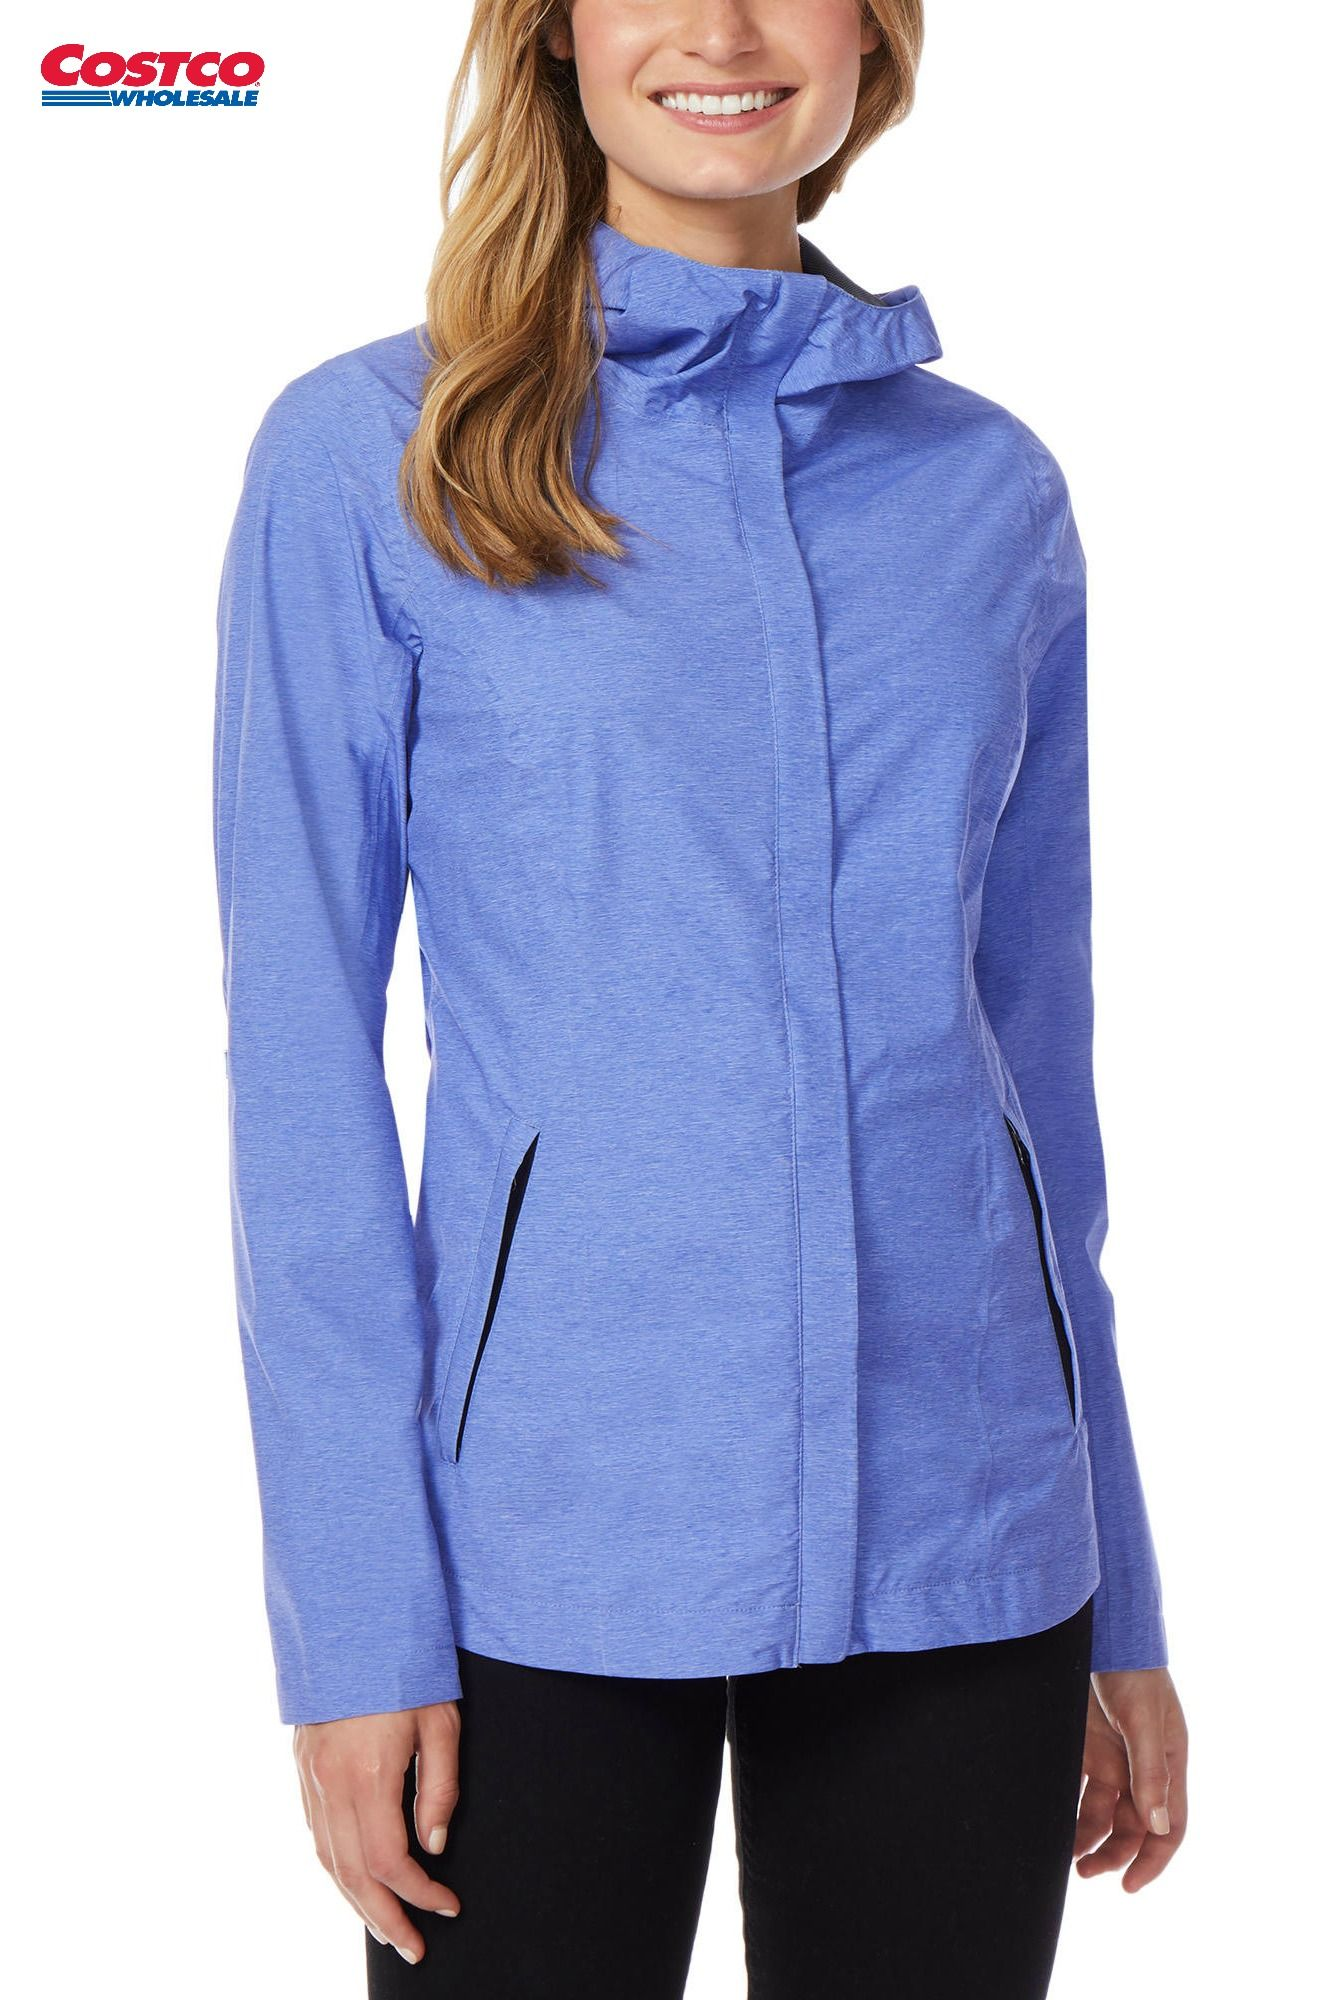 32 Degrees Ladies Rain Jacket 19 99 Find Additional Ladies Clothes On Costco Com Packable Rain Jacket Rain Jacket Women Jackets